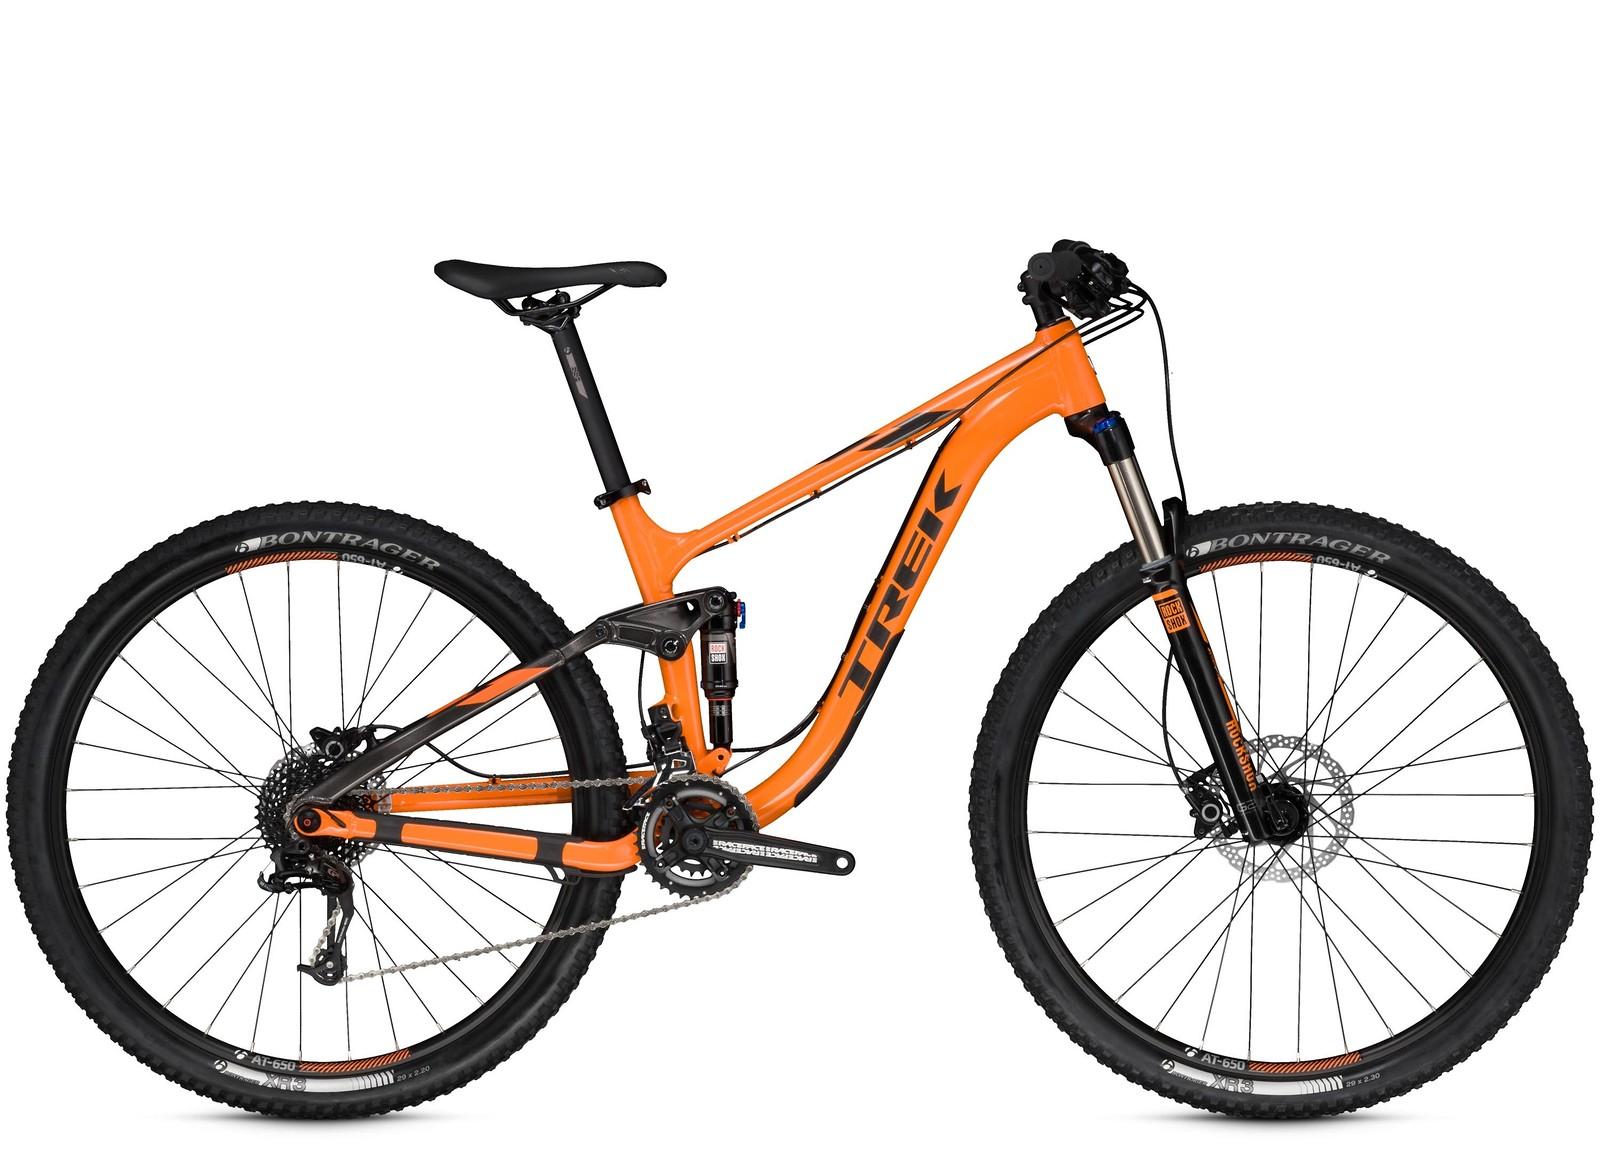 Trek Fuel EX 5 29 - FredLikesTrikes - Mountain Biking Pictures - Vital MTB